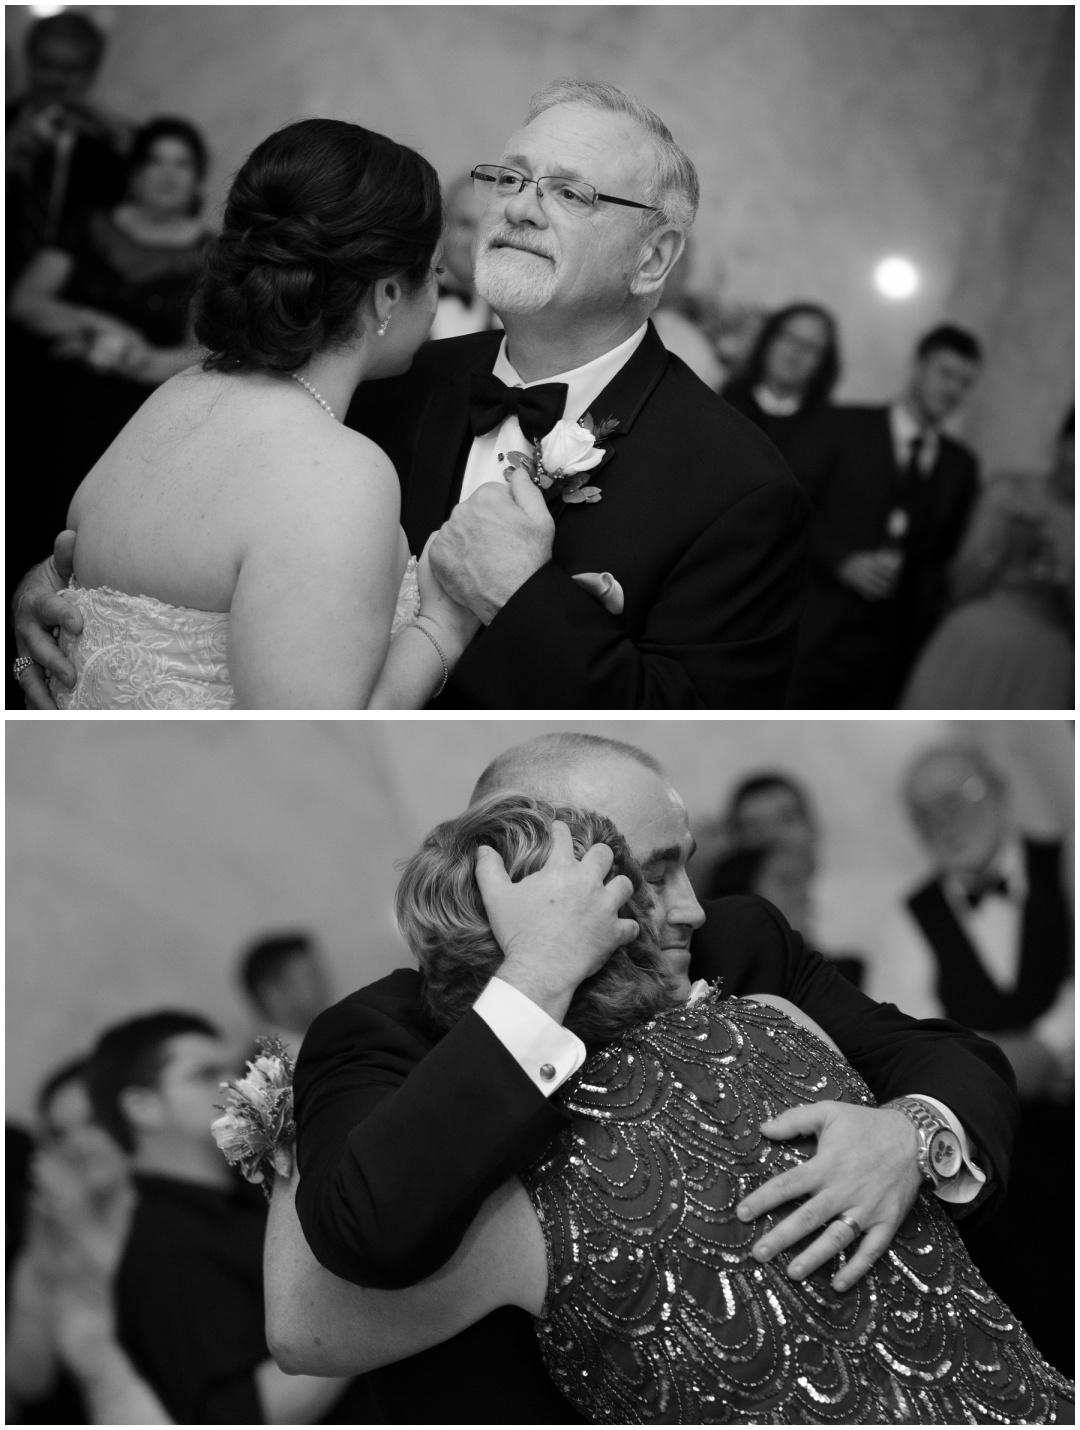 The-Grand-Wedding-Photos-Aaron-Haslinger-Photography_0013.jpg